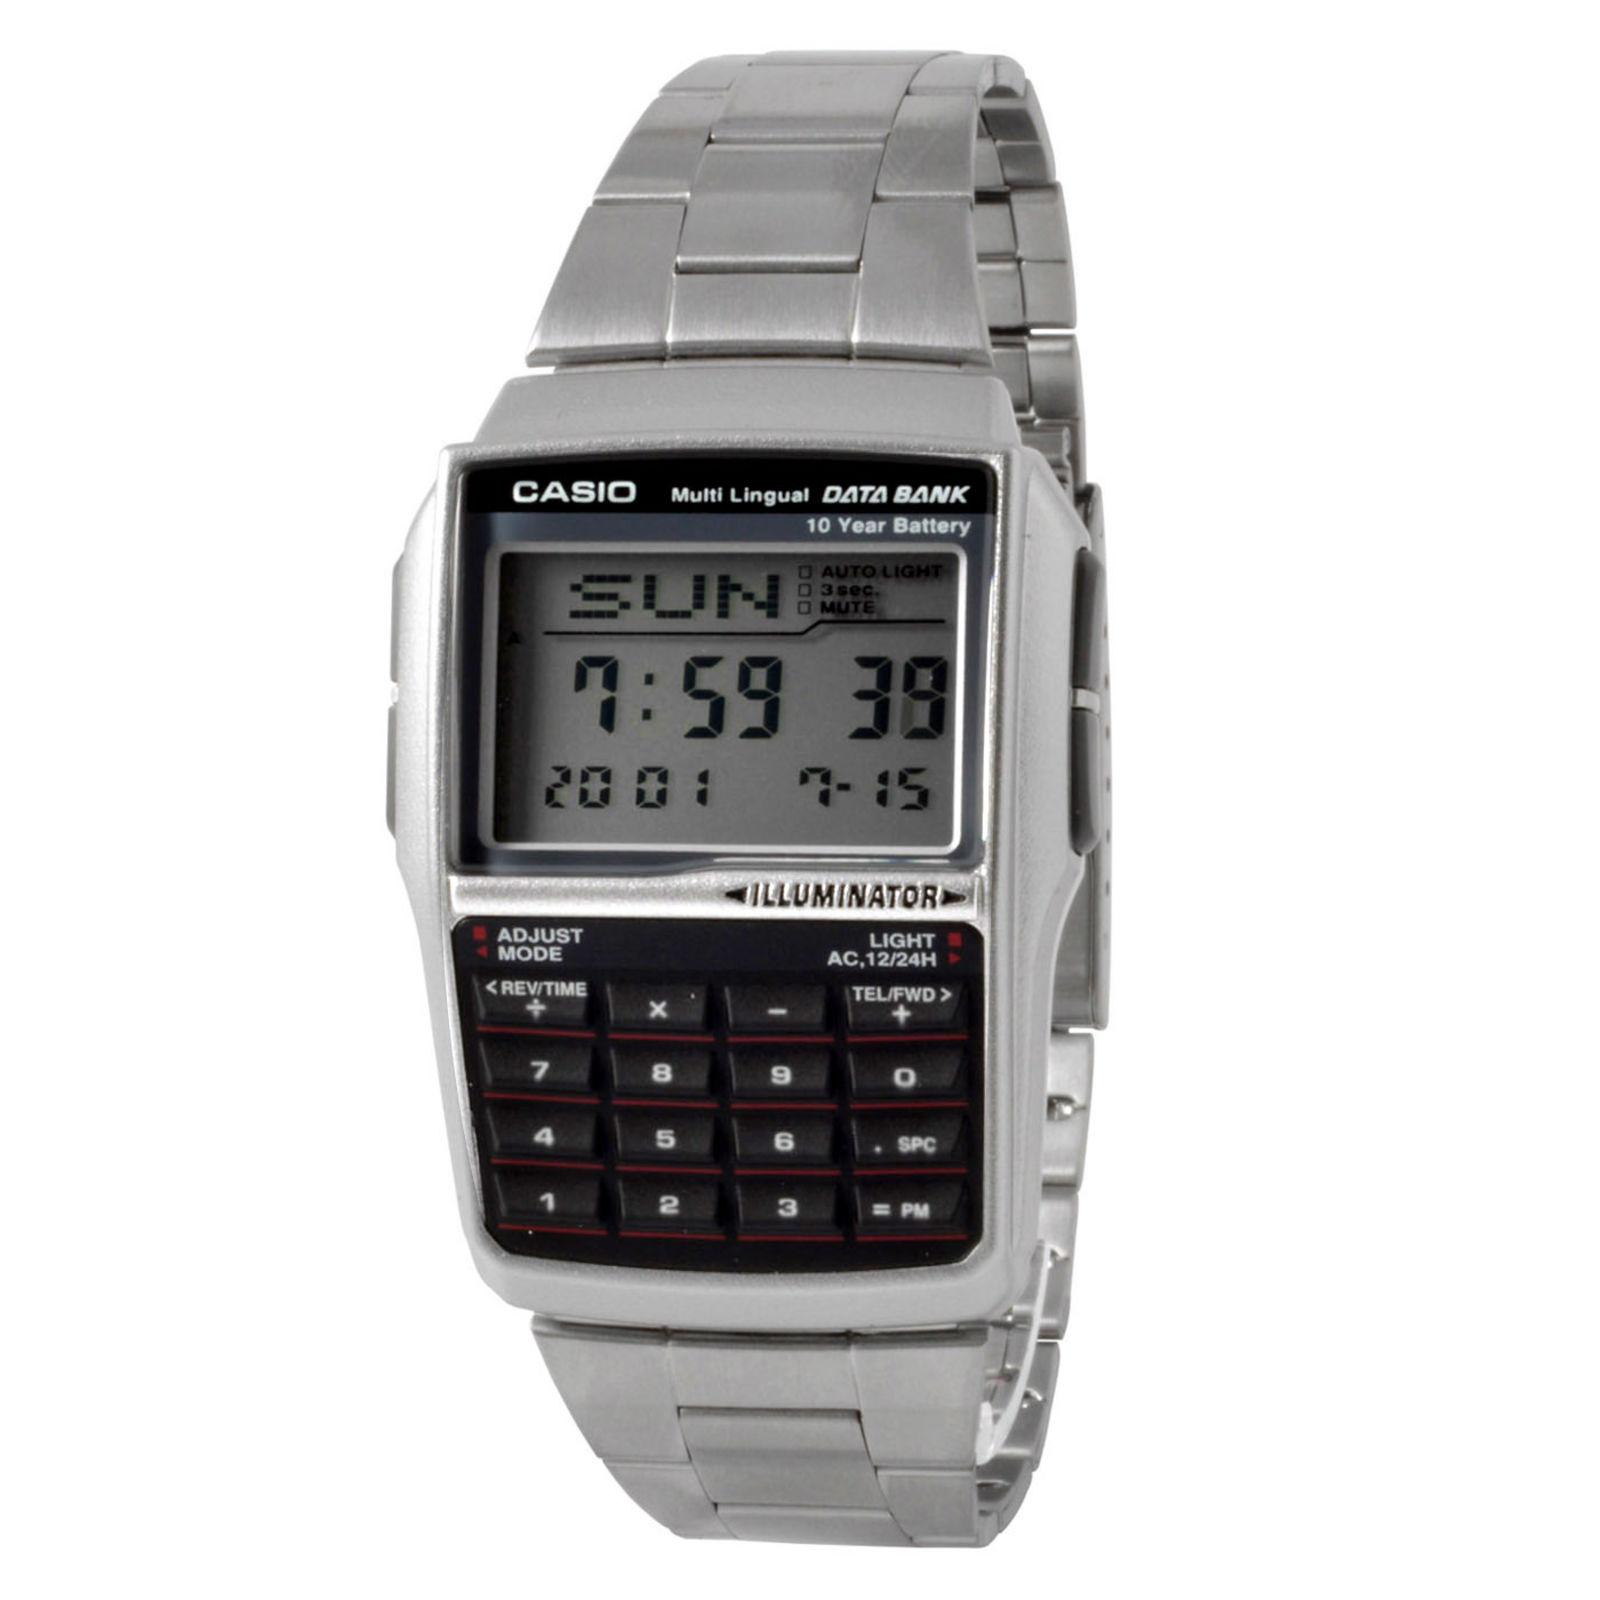 5bff35626111 Reloj plateado con banco de datos